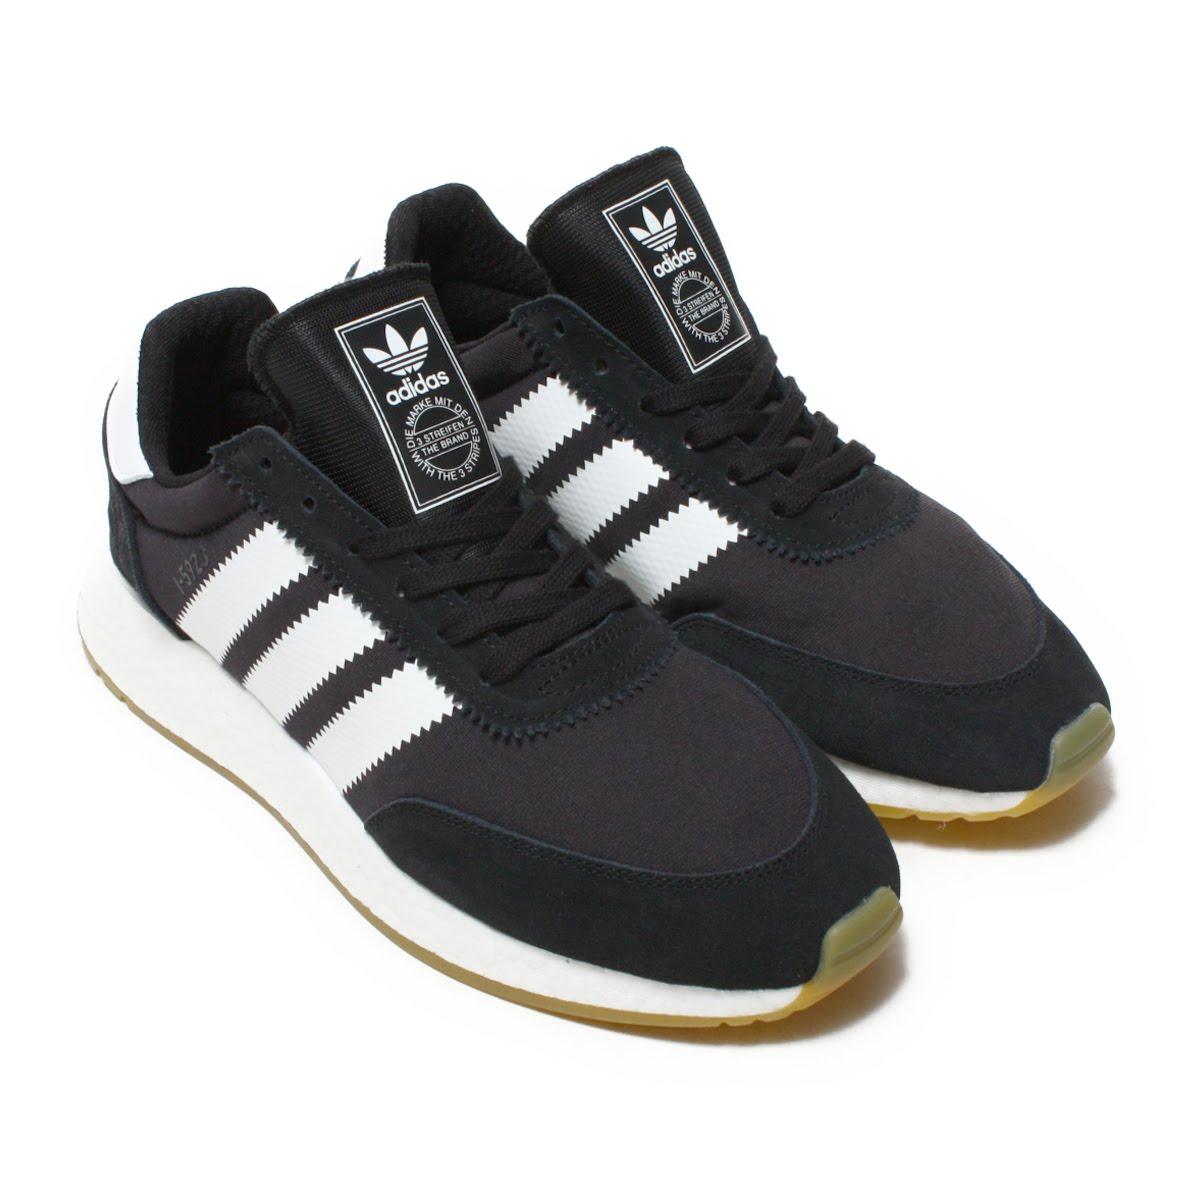 adidas Originals I-5923(アディダス I-5923)Core Black/Running White/Gum【メンズ スニーカー】18FW-I